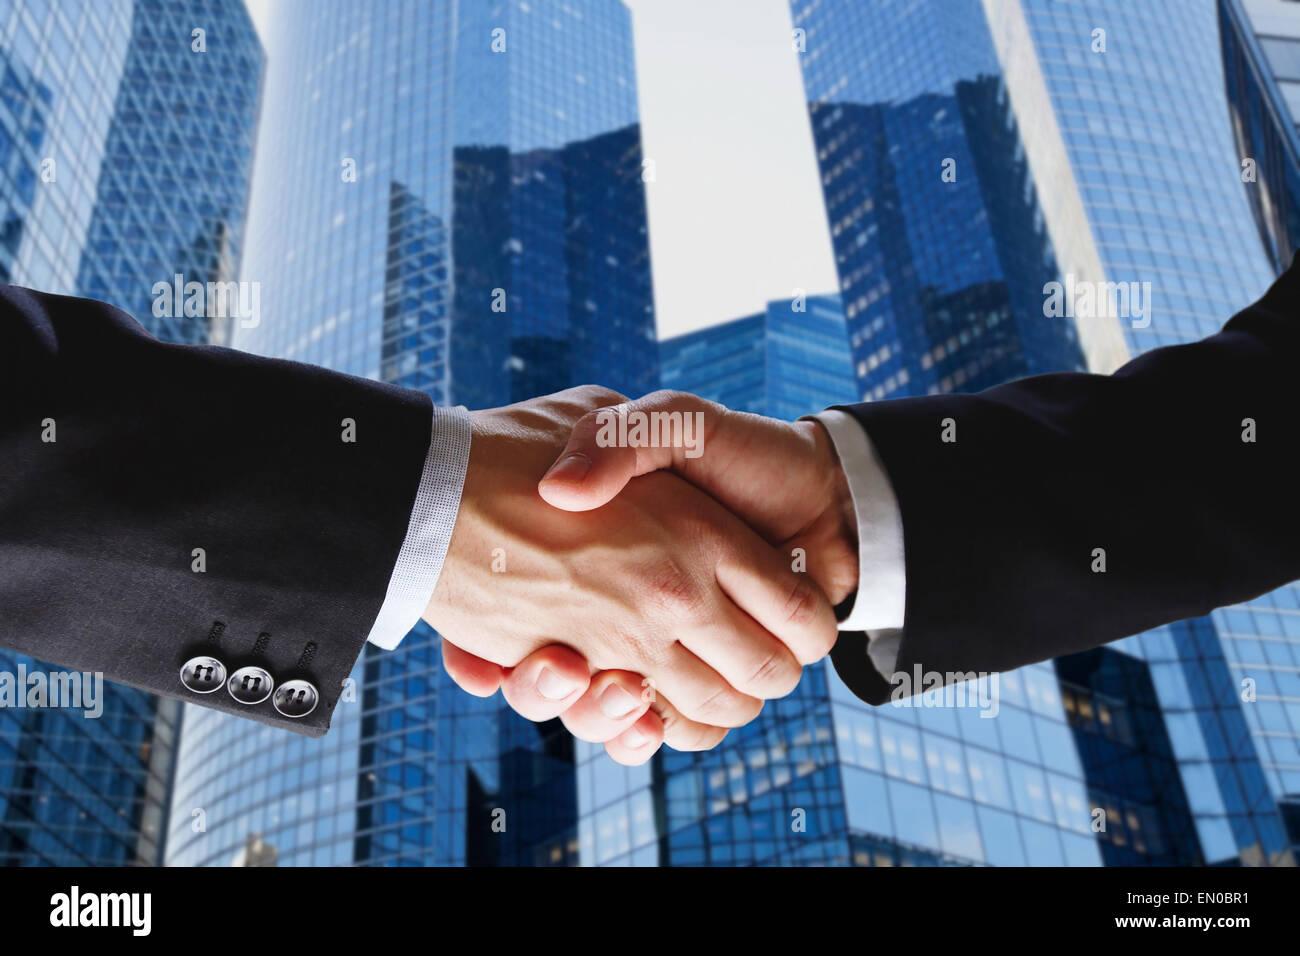 Affare, handshake moderna su sfondo blu Immagini Stock